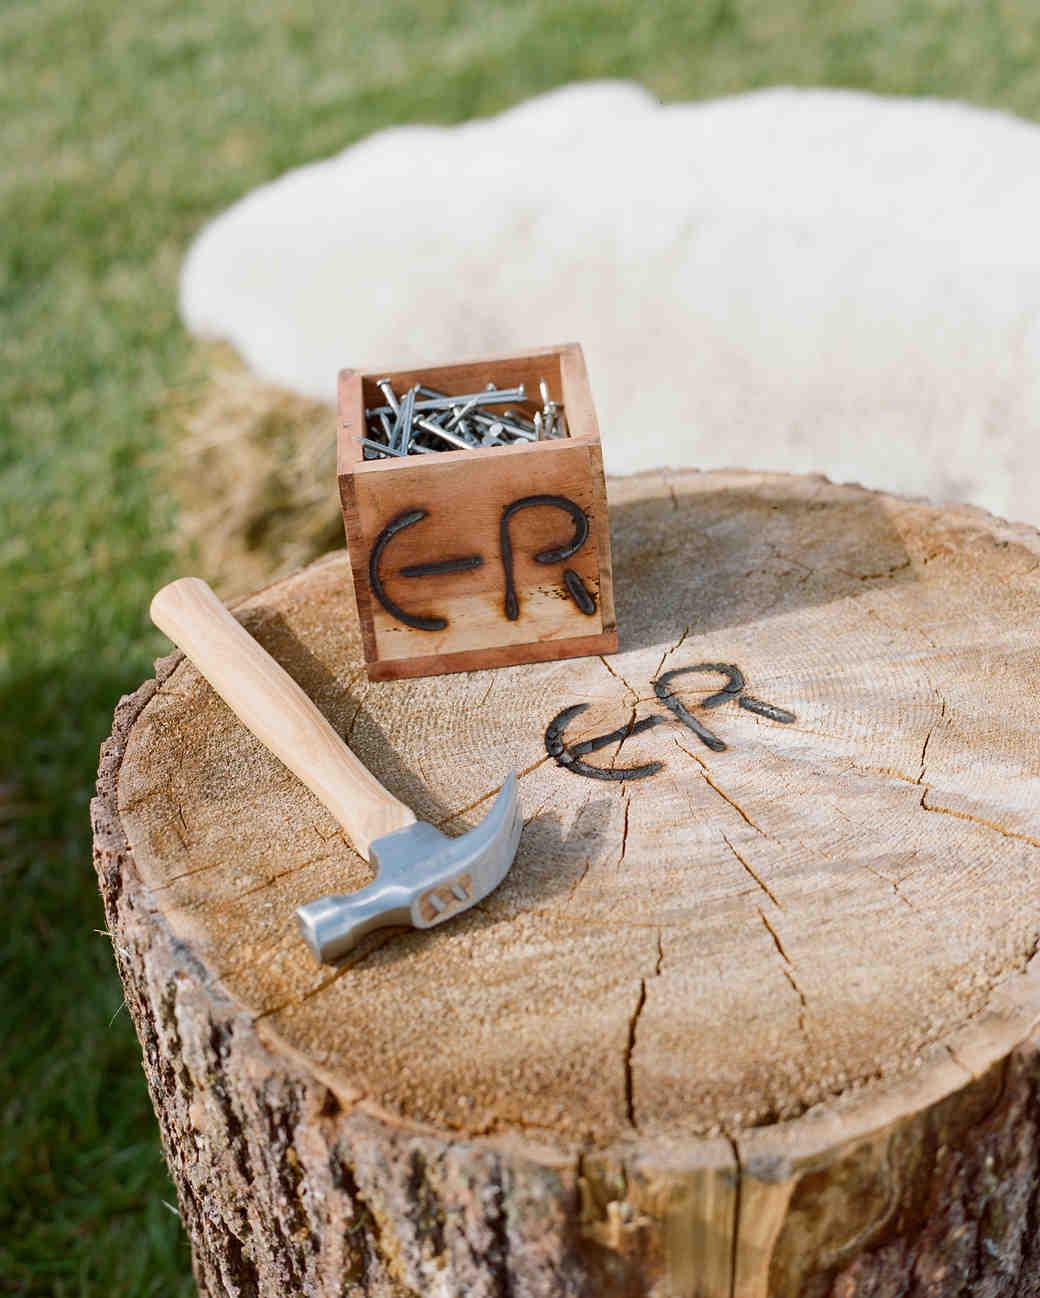 callie-eric-wedding-stump-422-s112113-0815.jpg